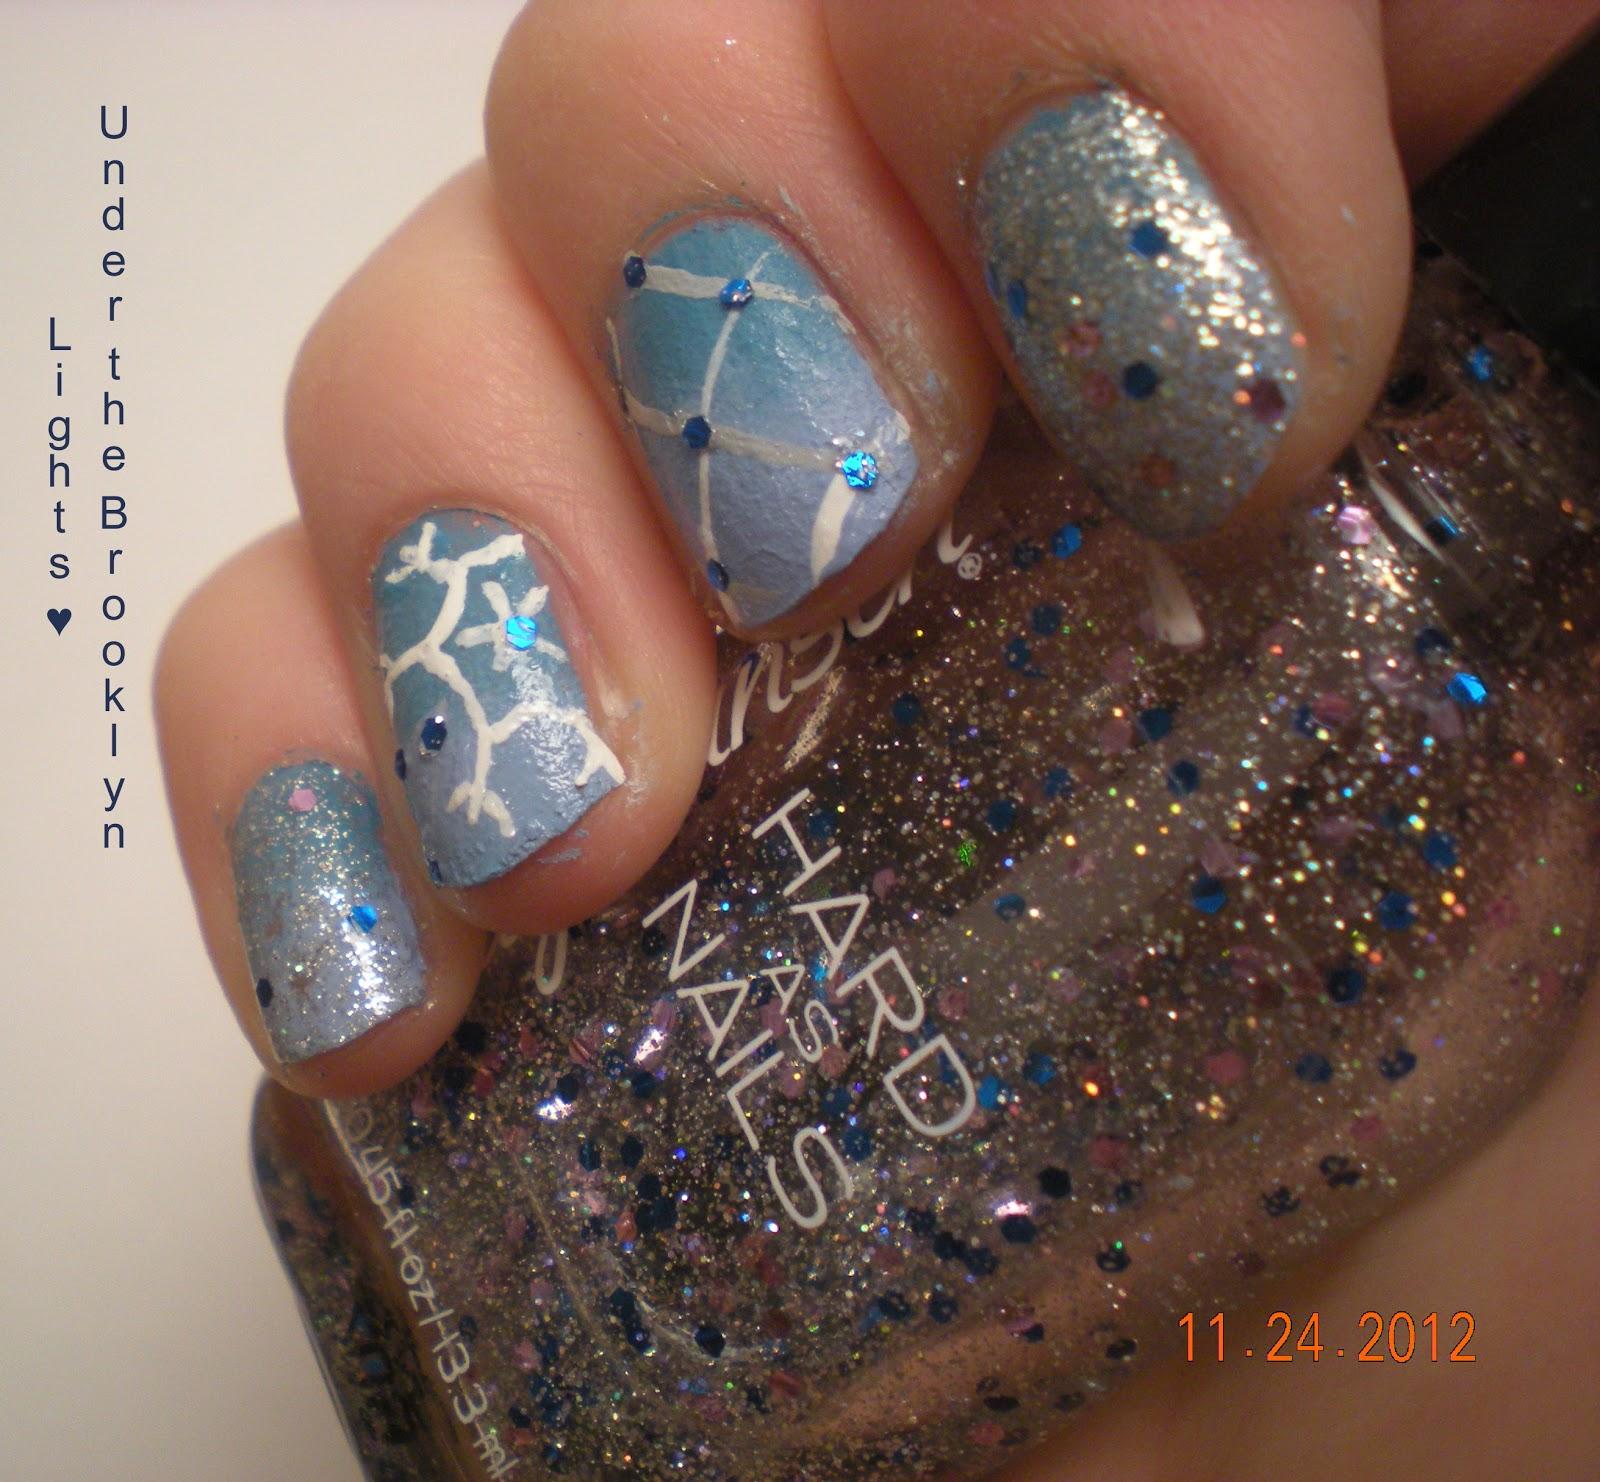 Snowflake Nail Art Tutorial: Under The Brooklyn Lights: Snowflake/Plaid Nail Art + Tutorial